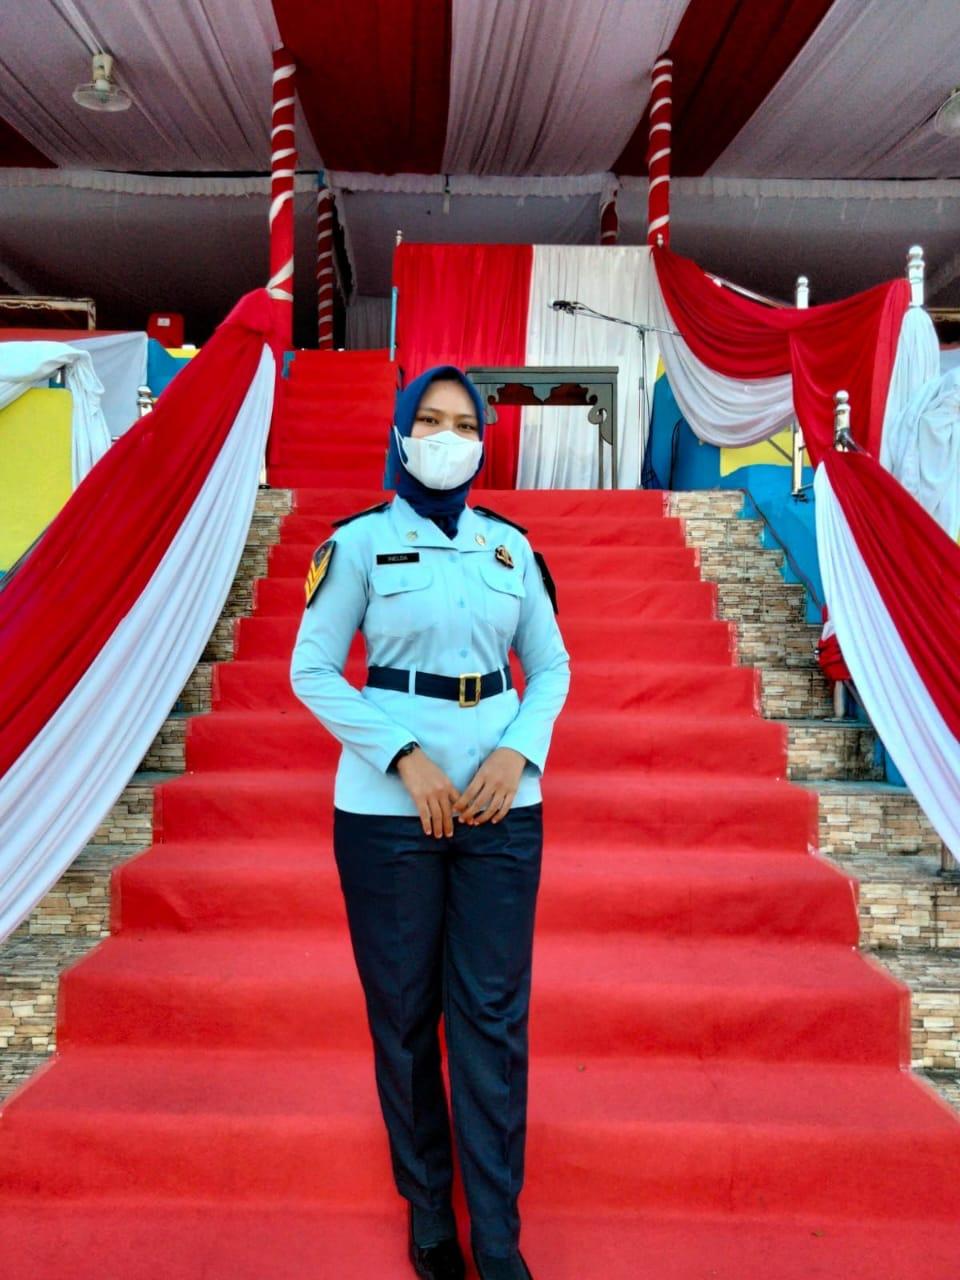 Imelda Dwi Jayanti Mahasiswa Politeknik Ilmu Pemasyarakatan Jurusan Manajemen Pemasyarakatan.